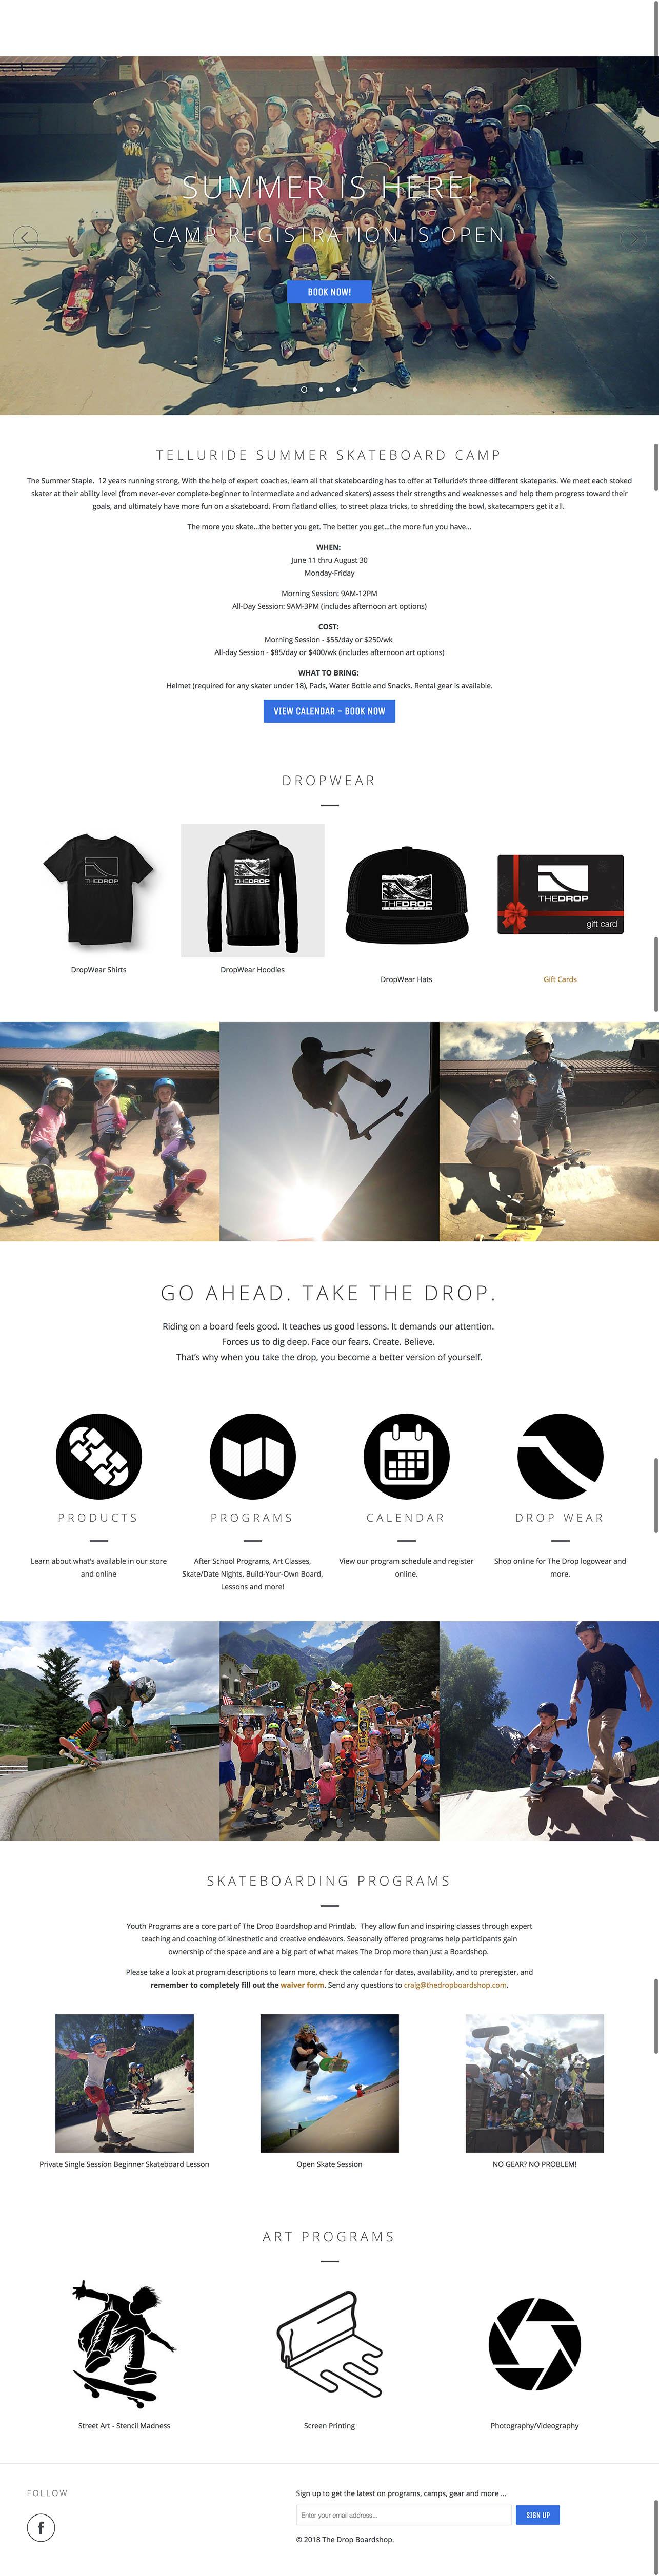 The Drop Boardshop Website